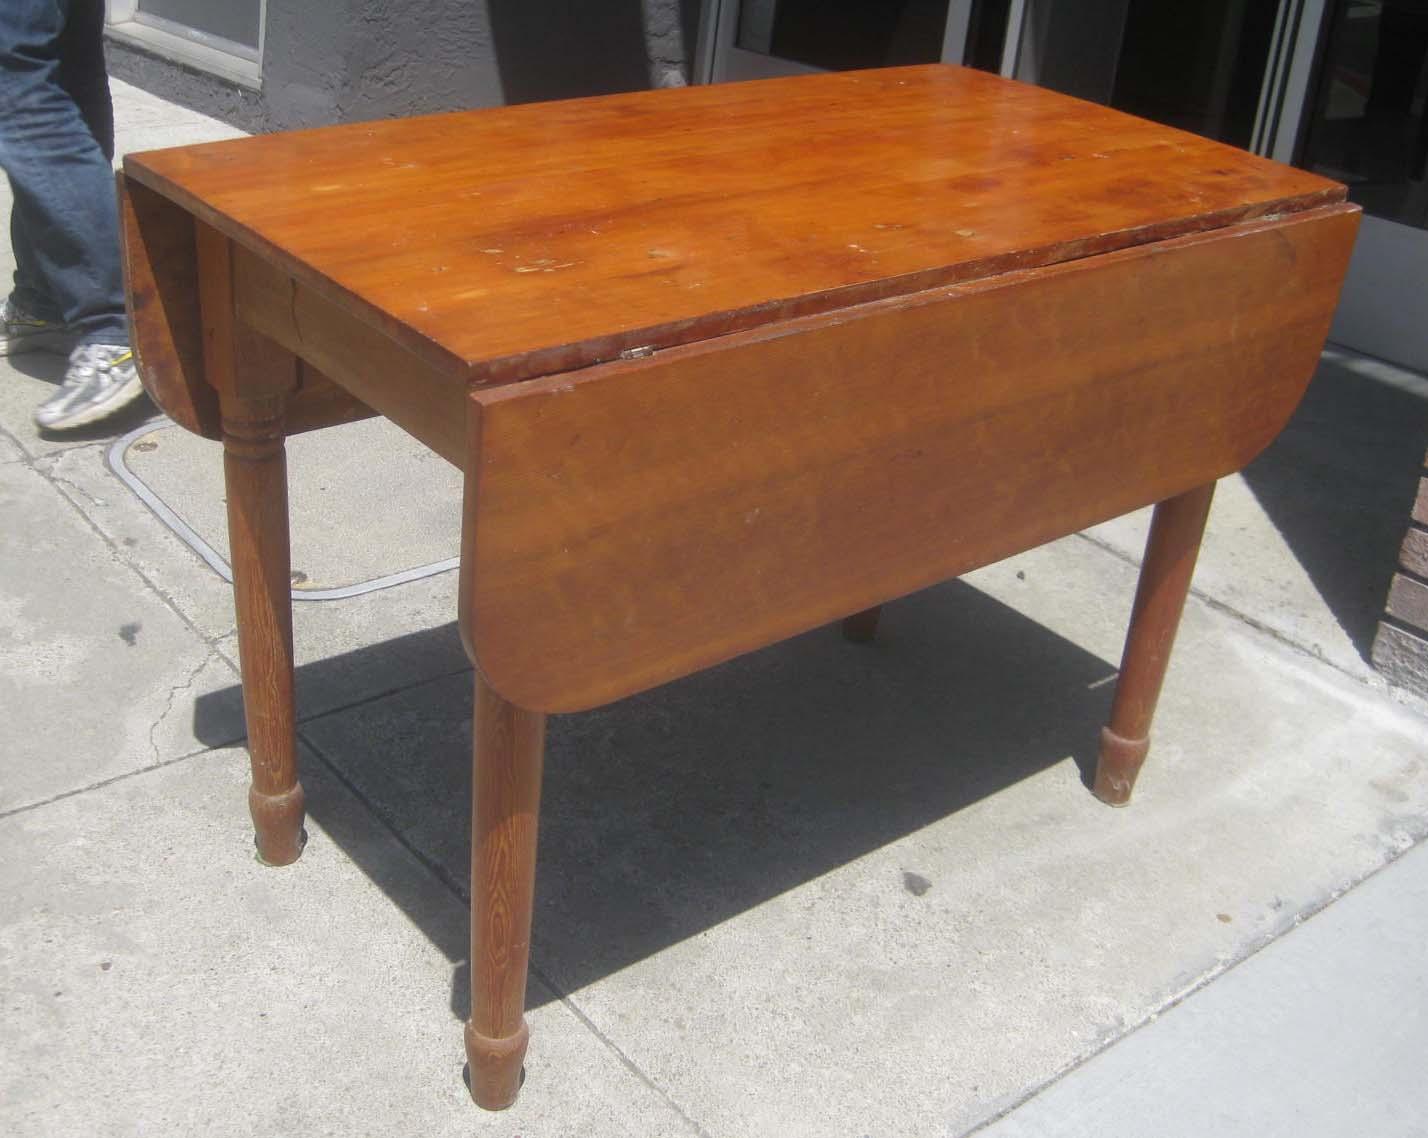 UHURU FURNITURE amp COLLECTIBLES SOLD Pine Drop Leaf  : TableDropLeaf1 from uhurufurniture.blogspot.com size 1428 x 1138 jpeg 107kB